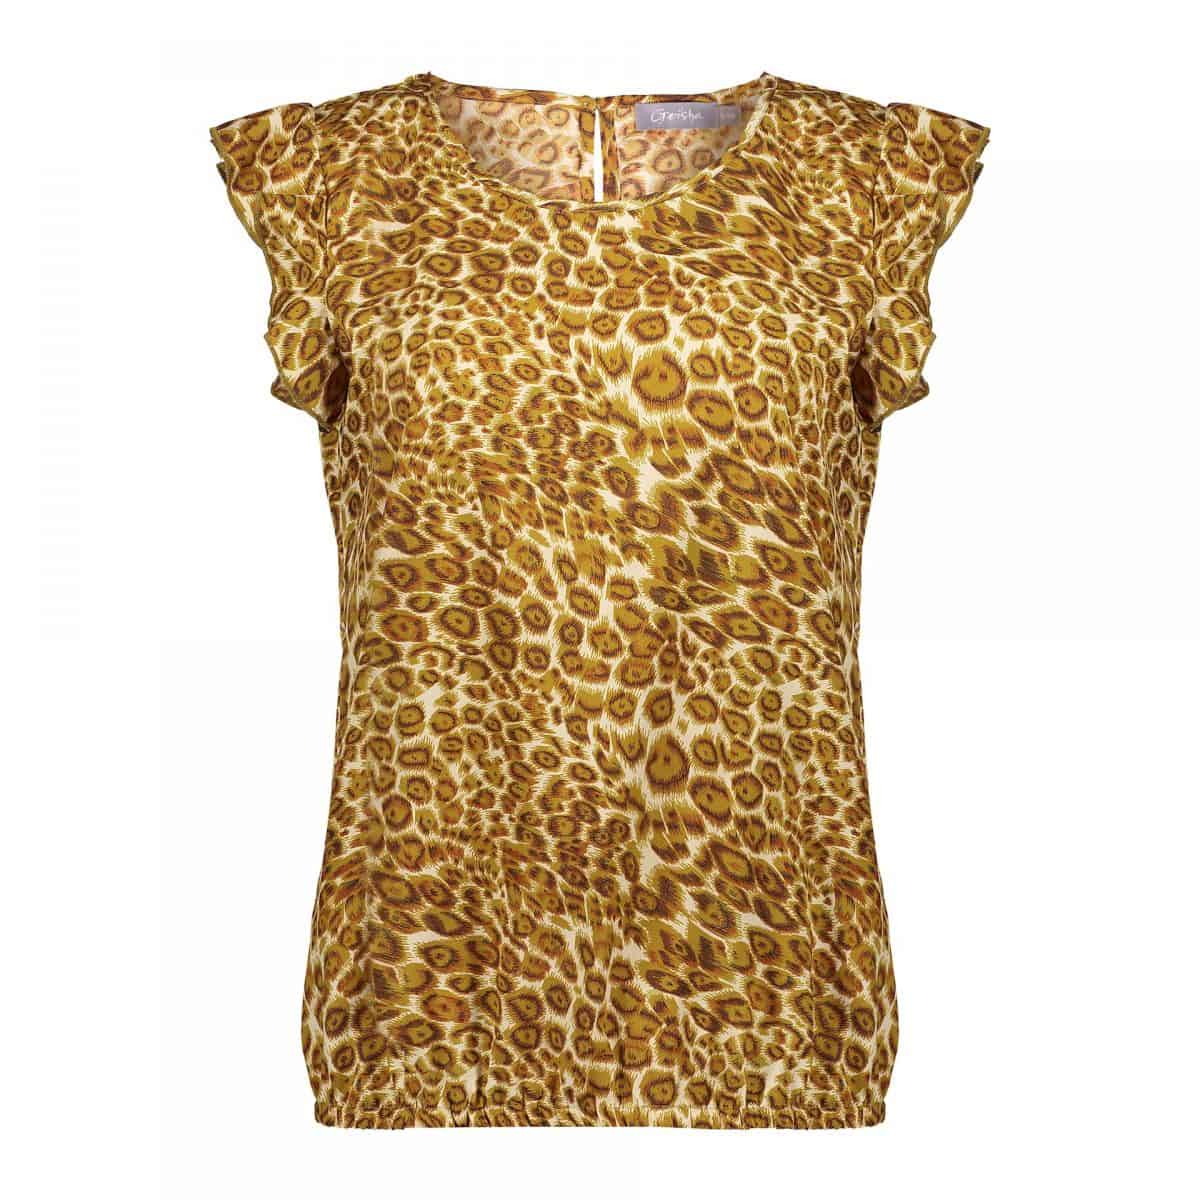 Geisha Top AOP Leopard Ruffle Sleeveless